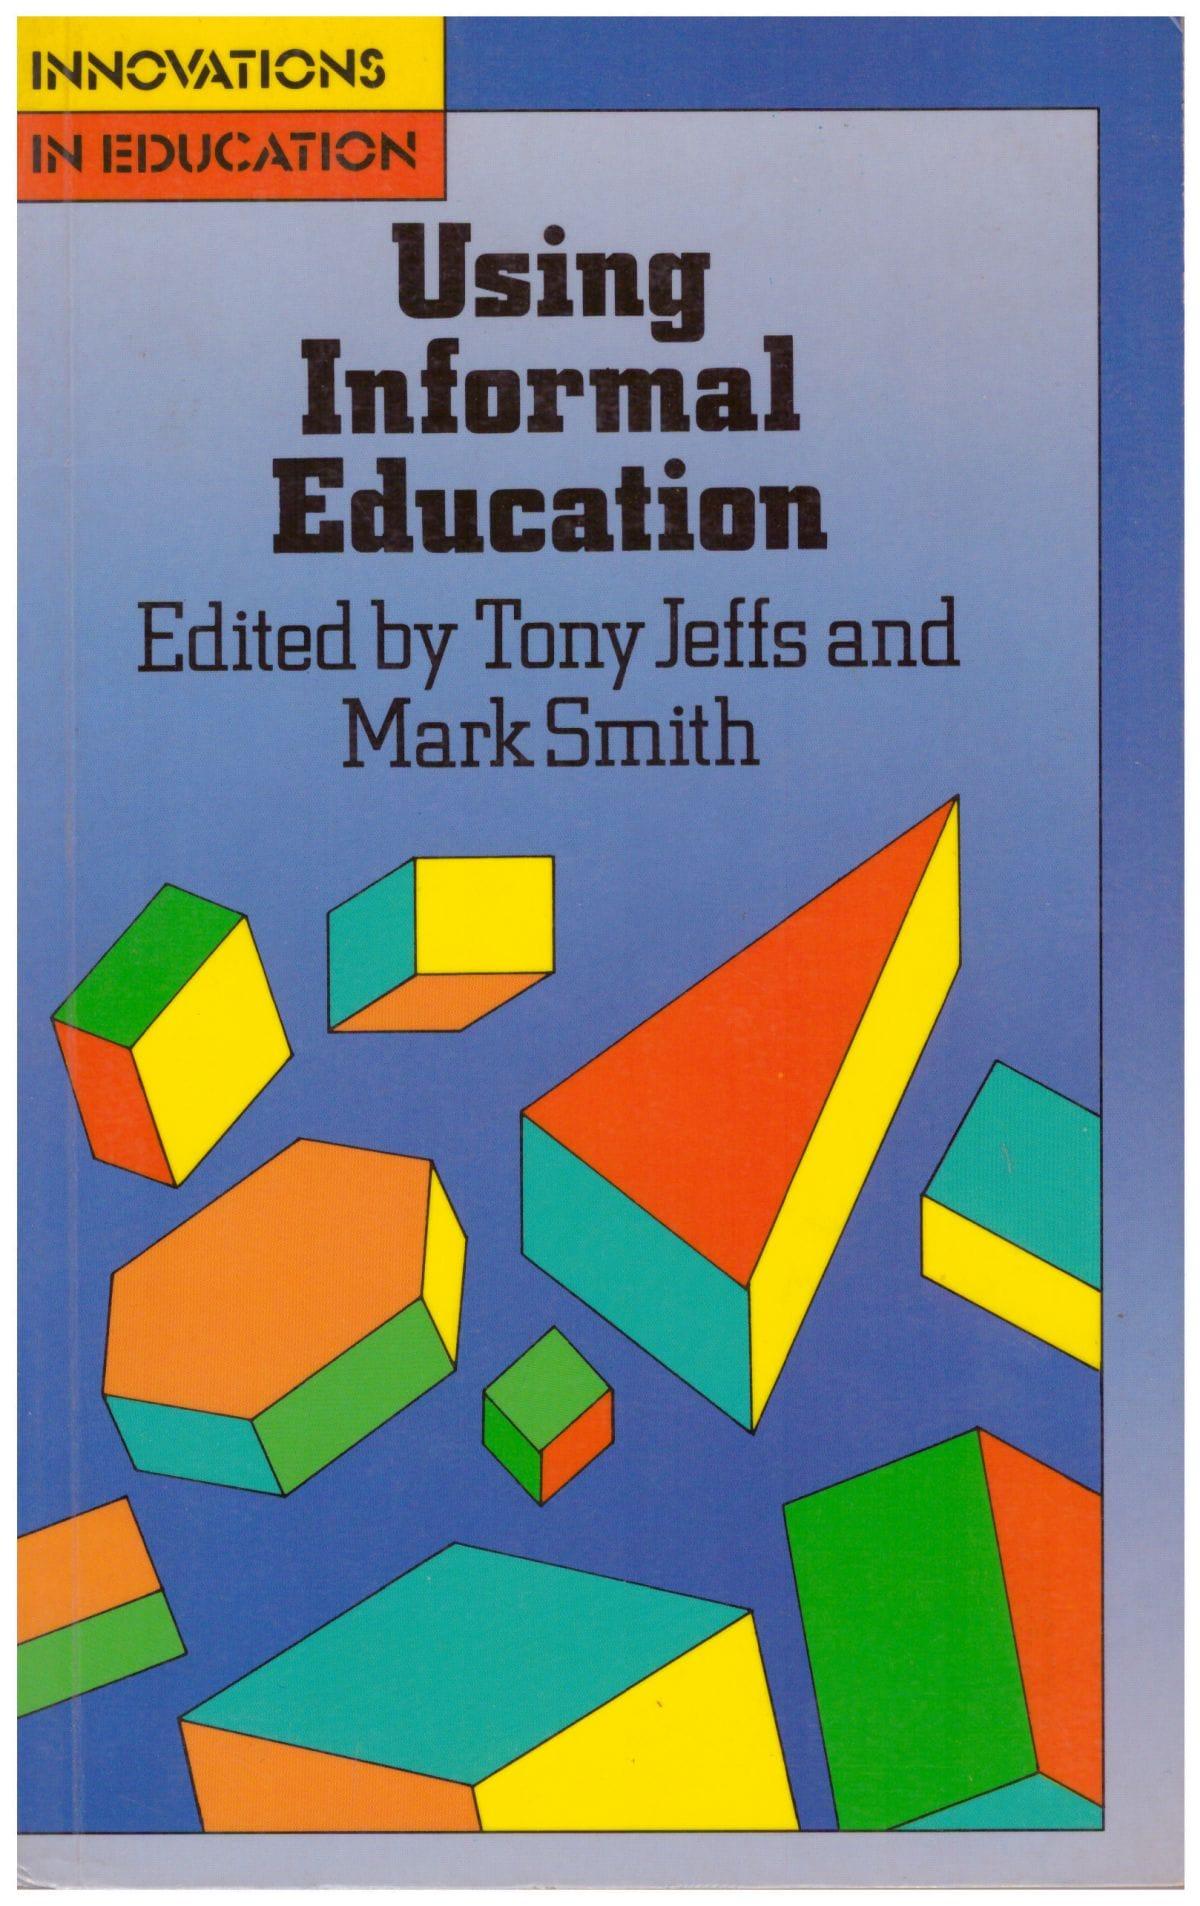 using informal education